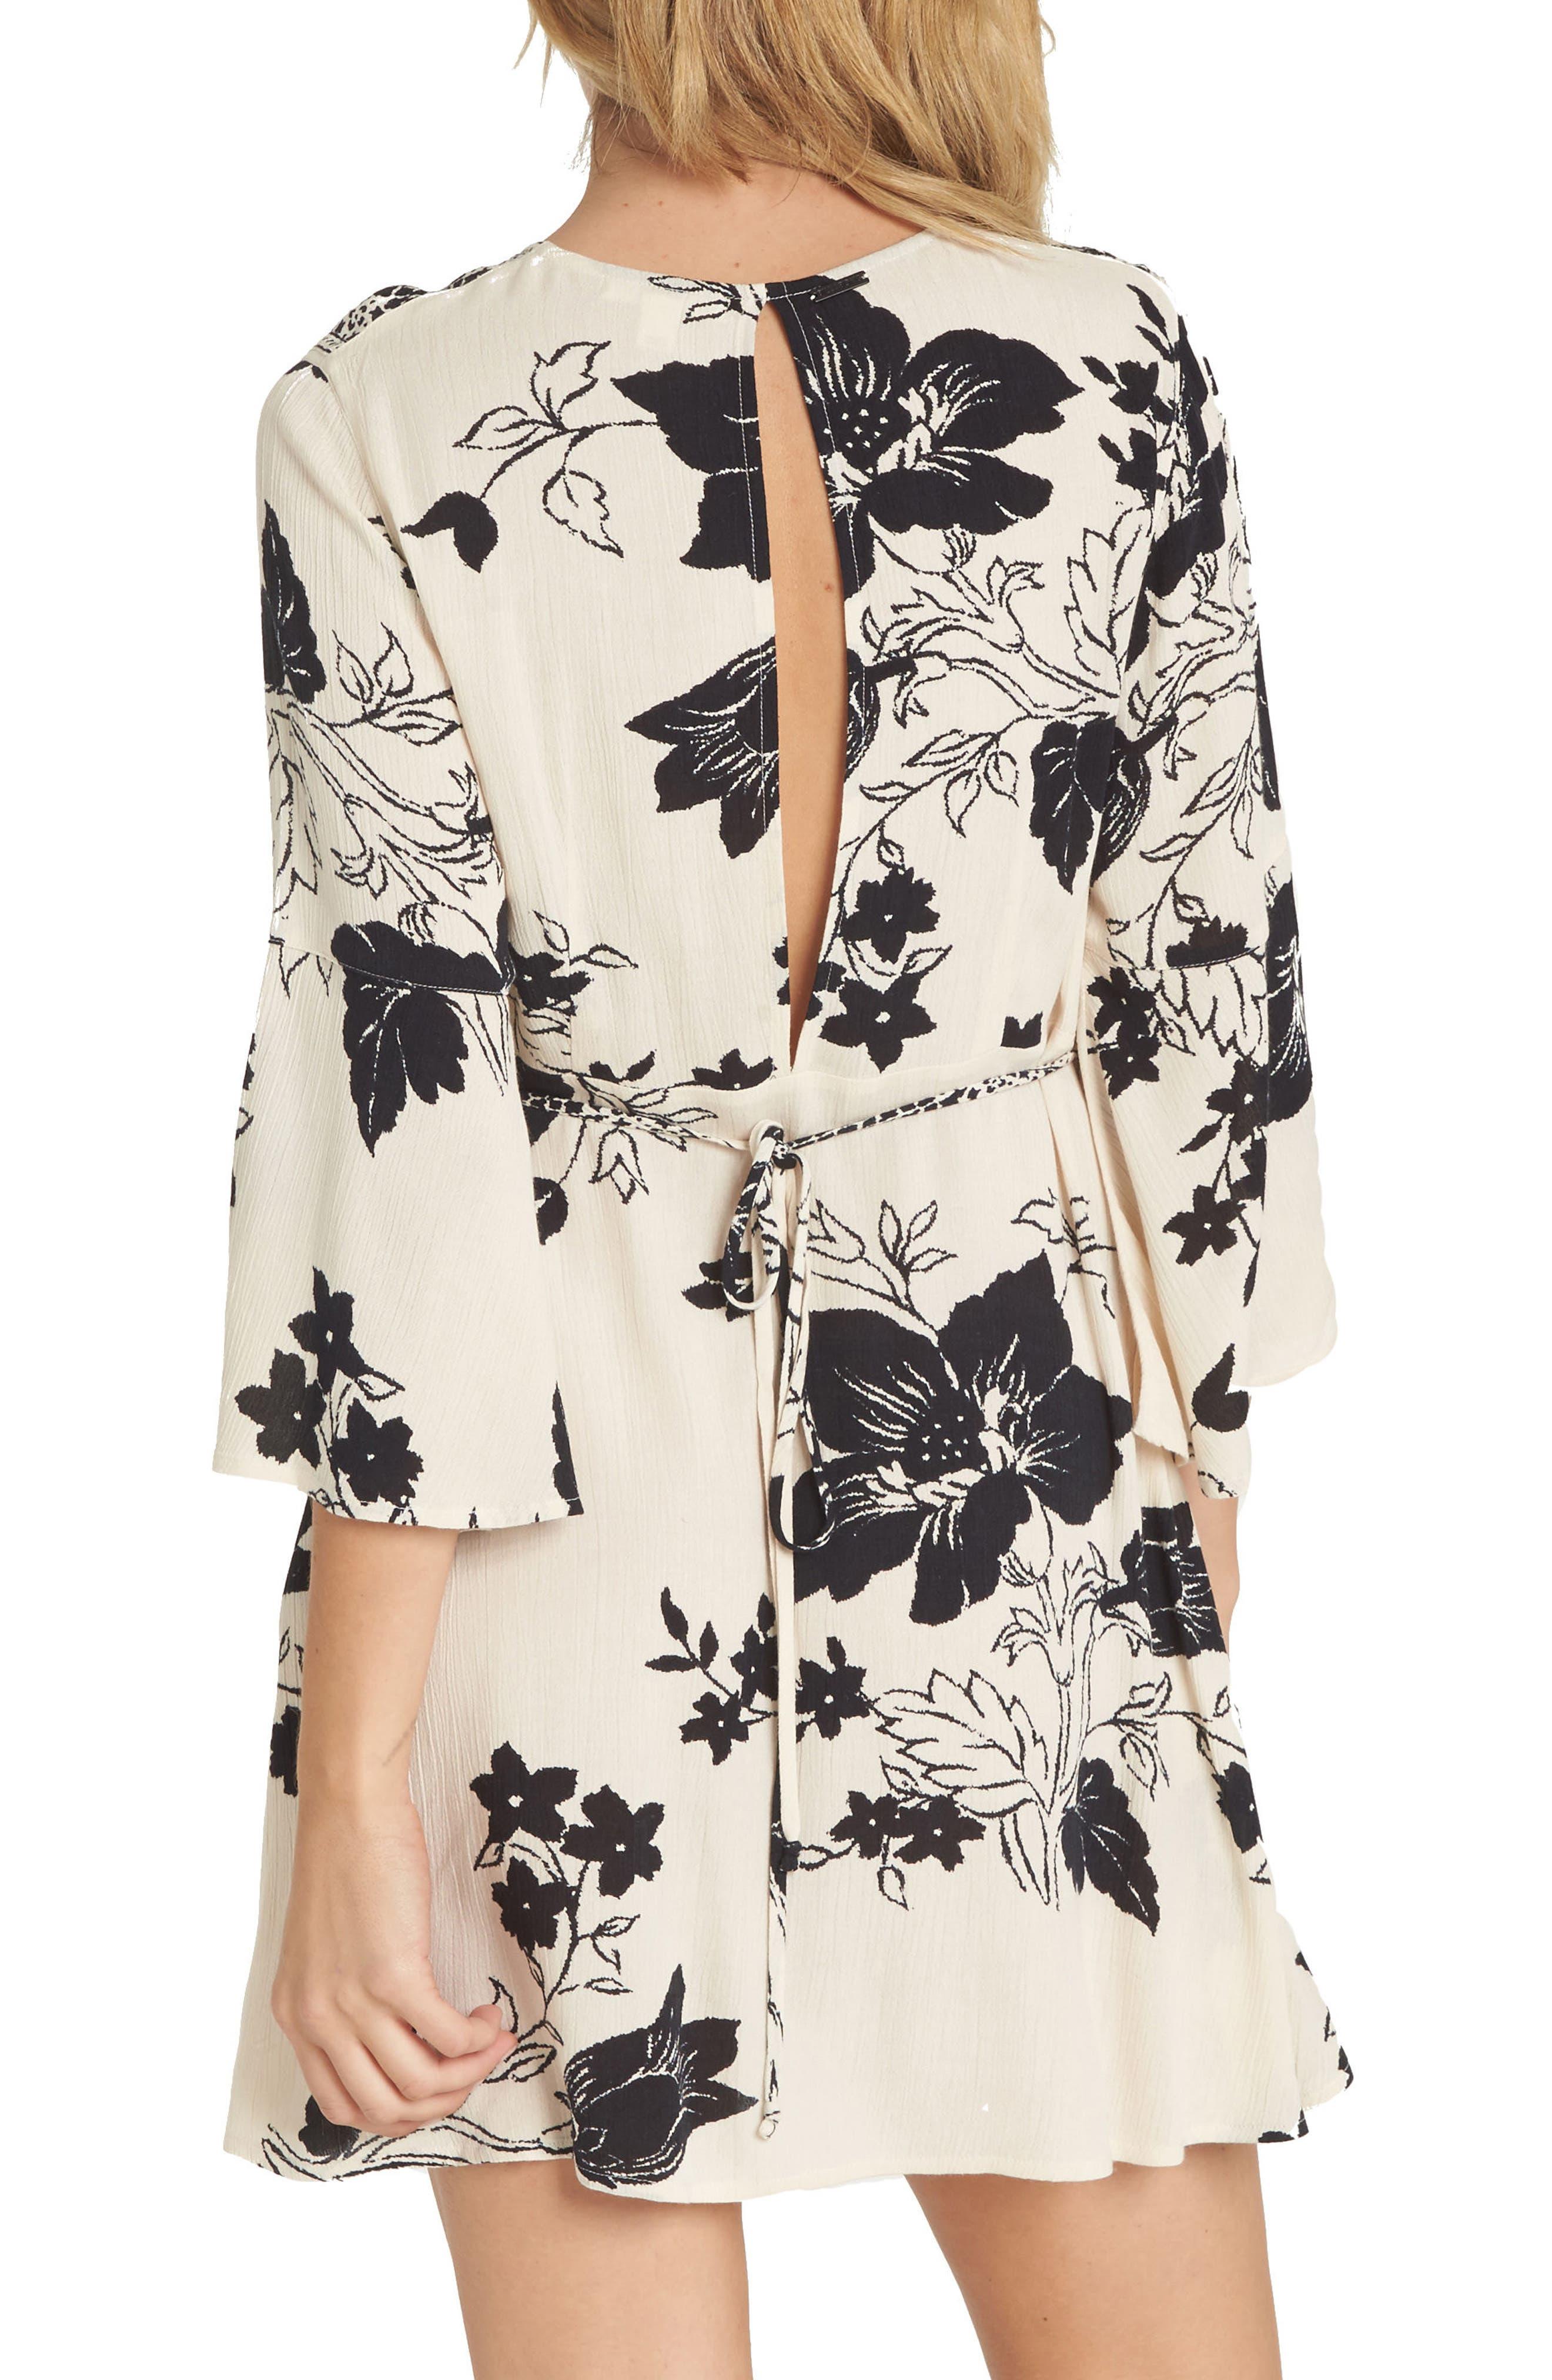 Divine Floral Print Dress,                             Alternate thumbnail 2, color,                             Ivory